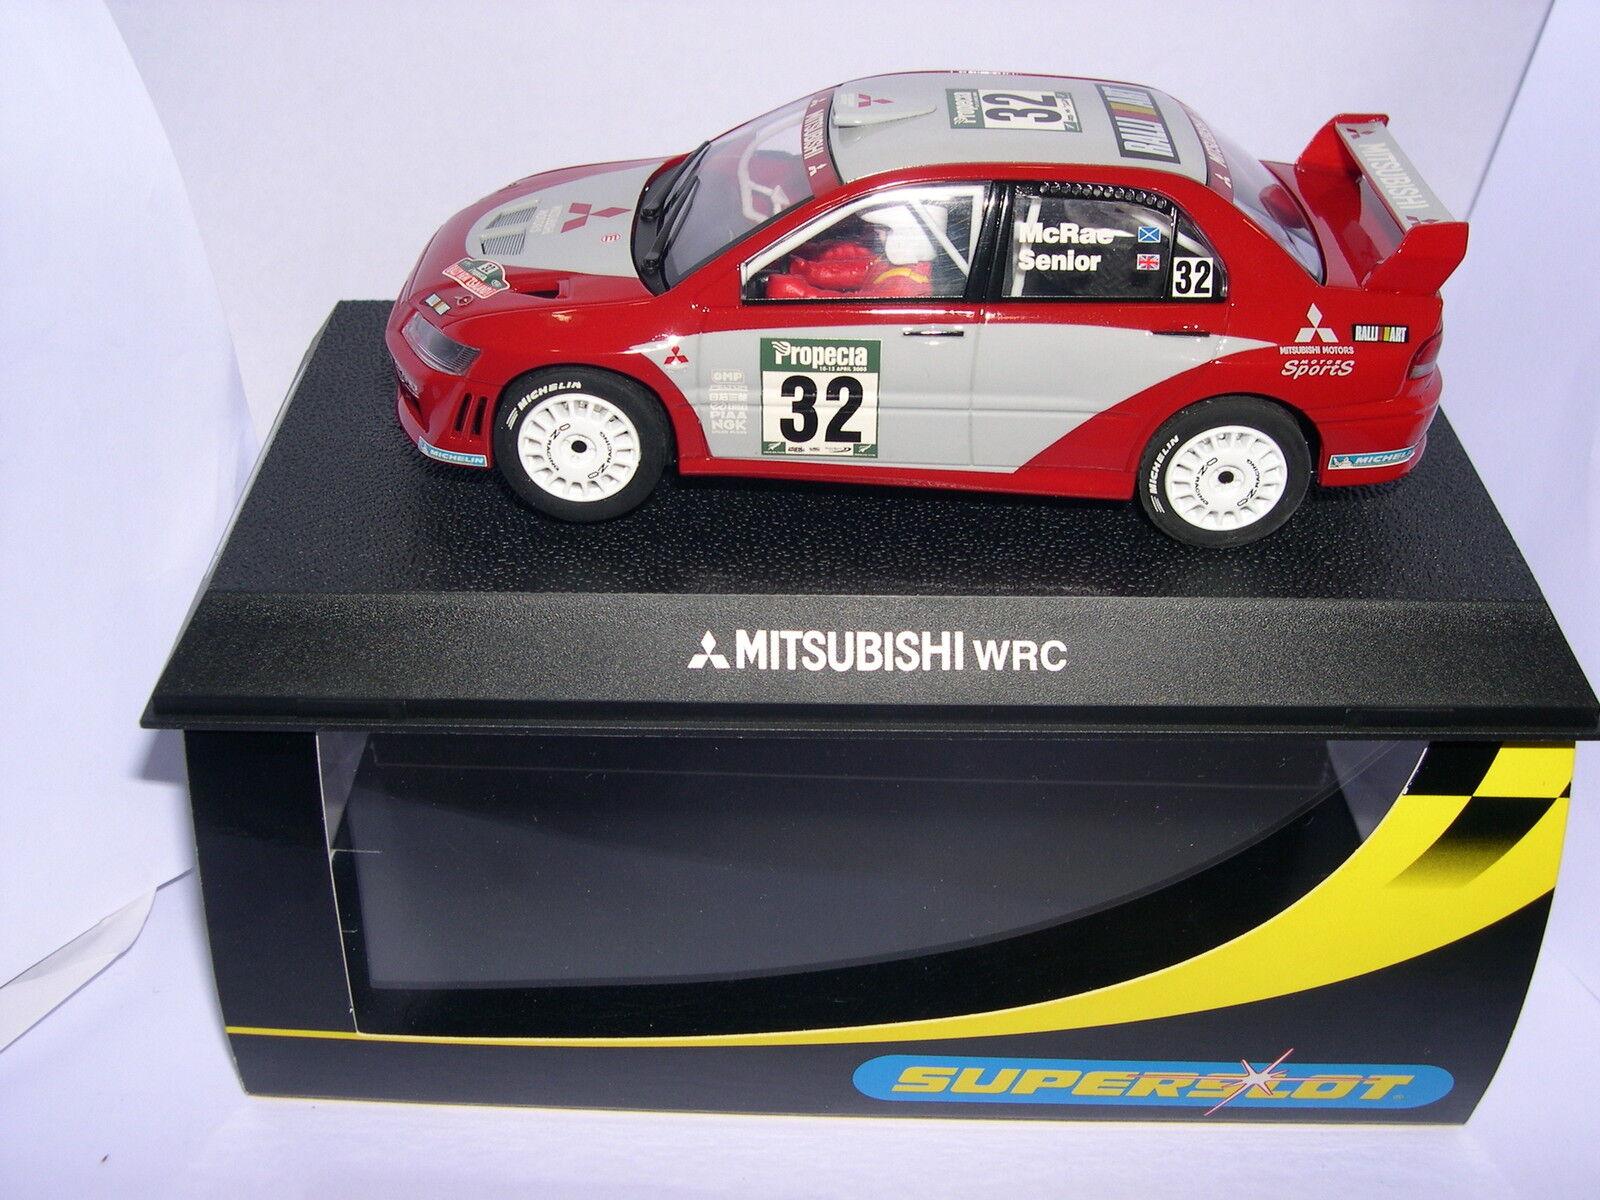 Superslot H2494 Mitsubishi Lancer WRC McCrae Senior Scalcextric Ru MB